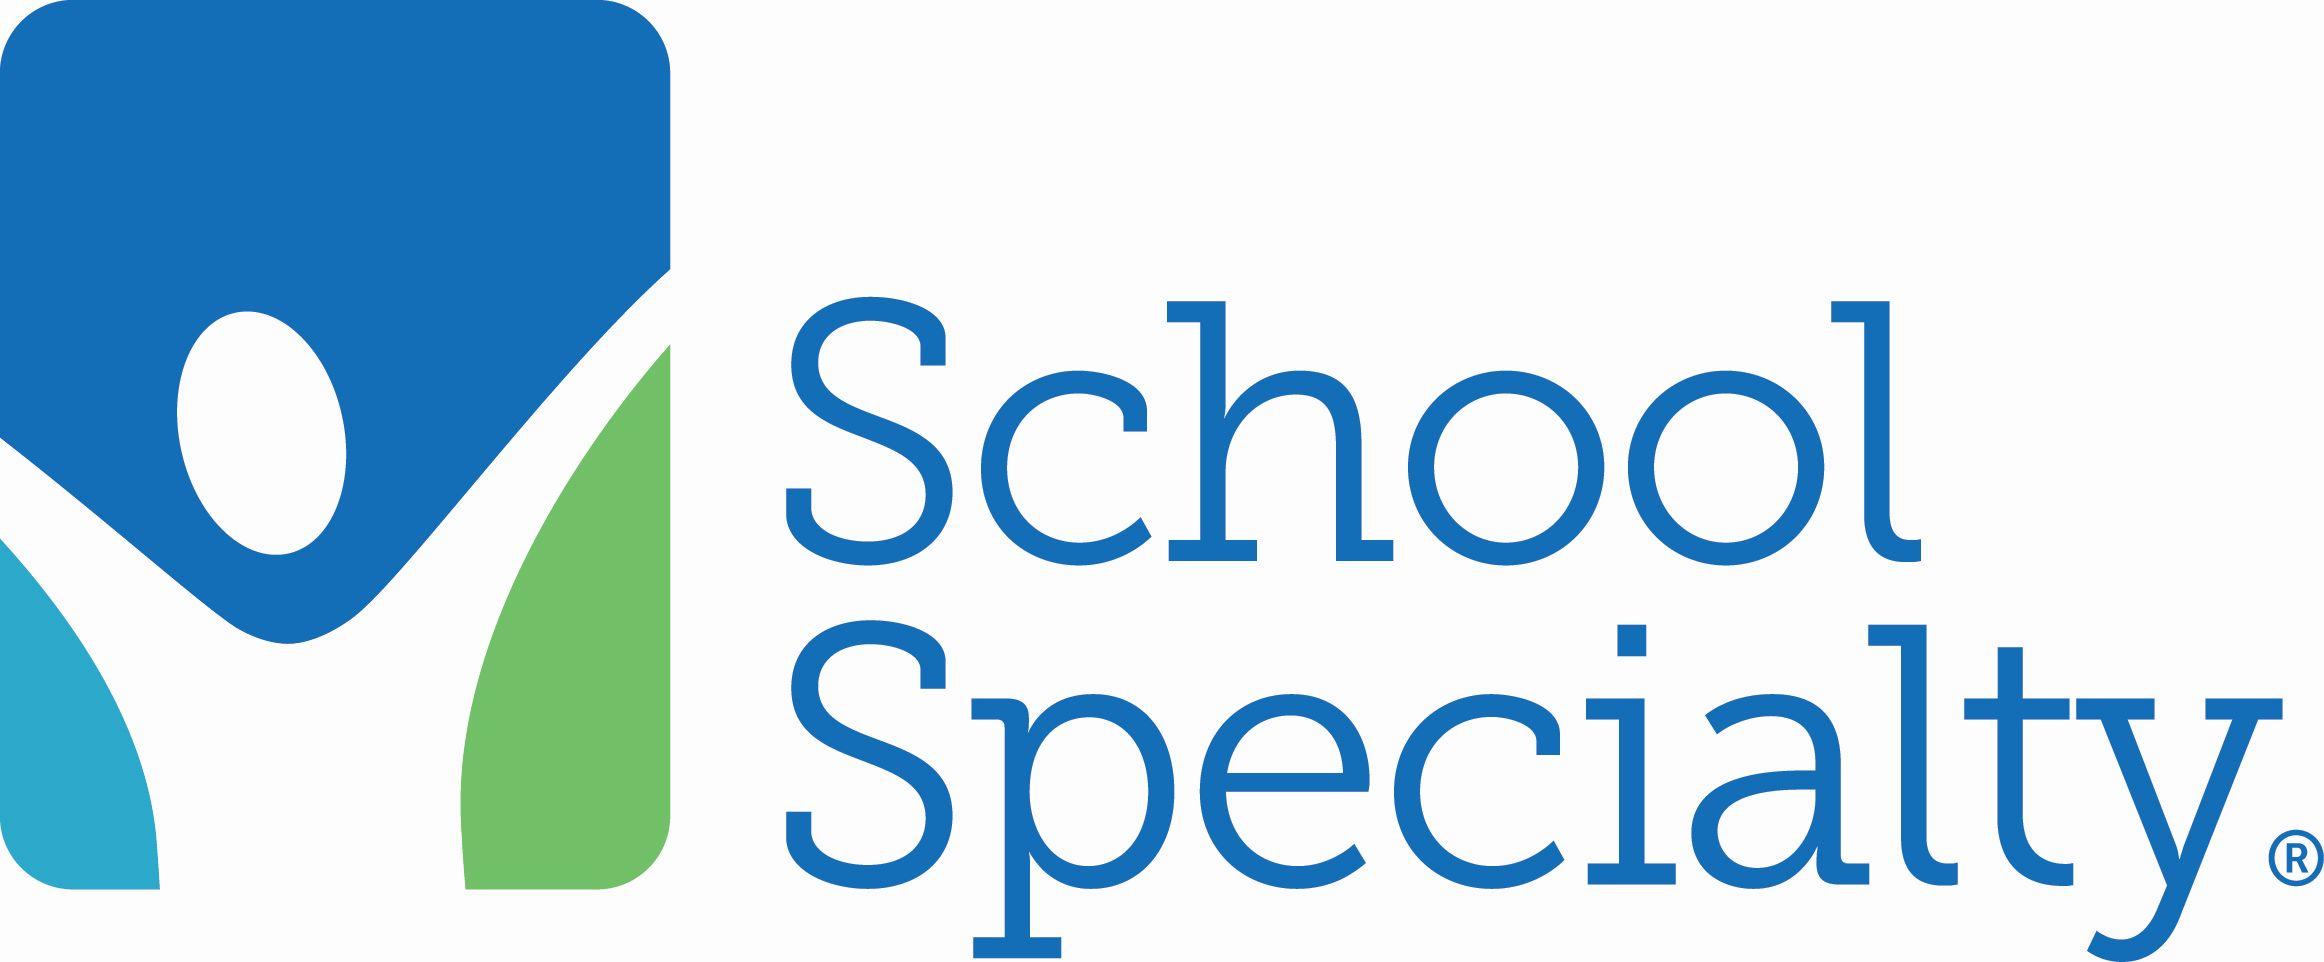 School Specialty Introduces The 21st Century Safe School Concept OTCBB:SCOO